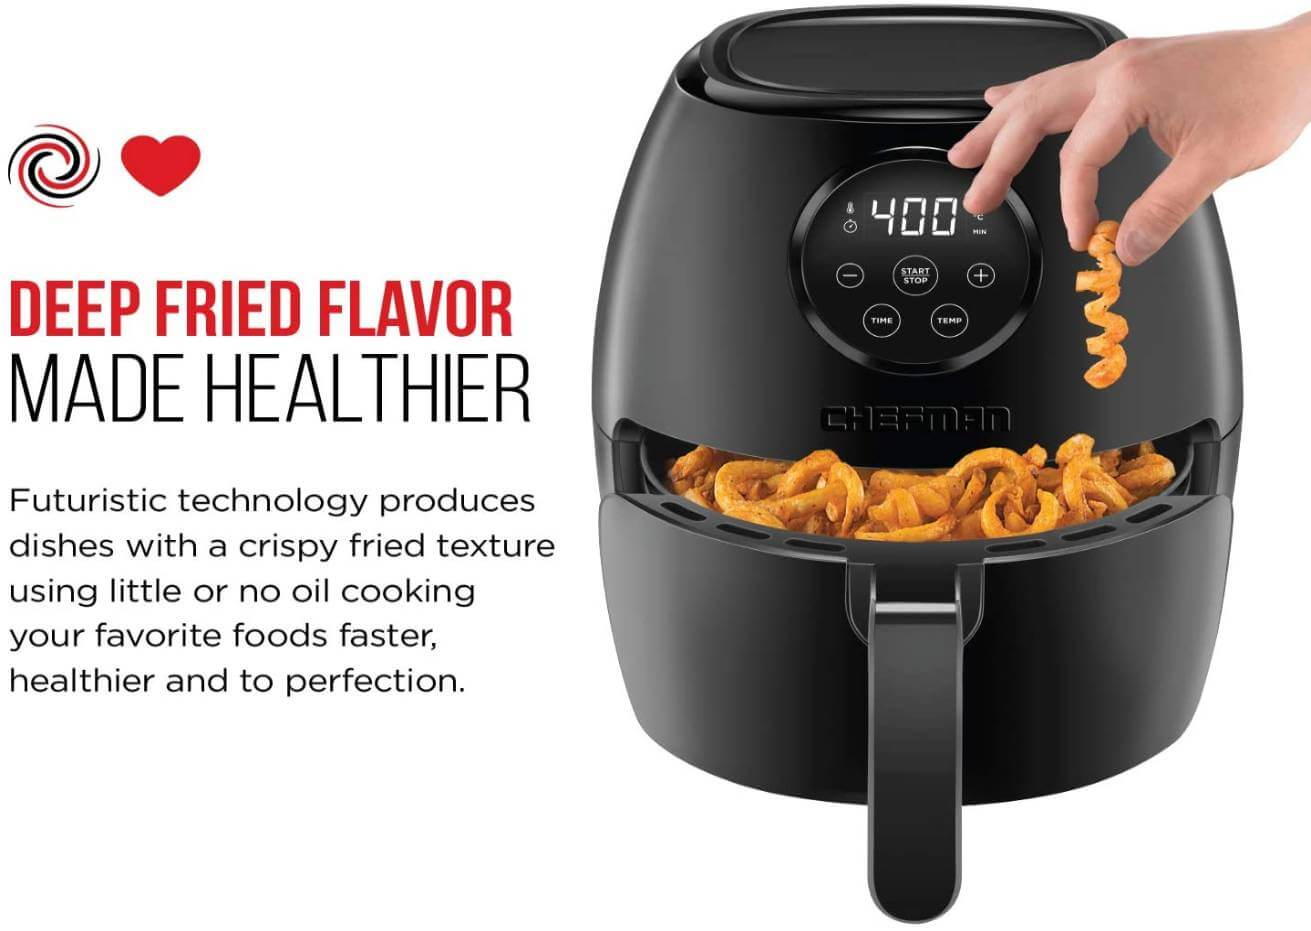 chefman air fryer reviews